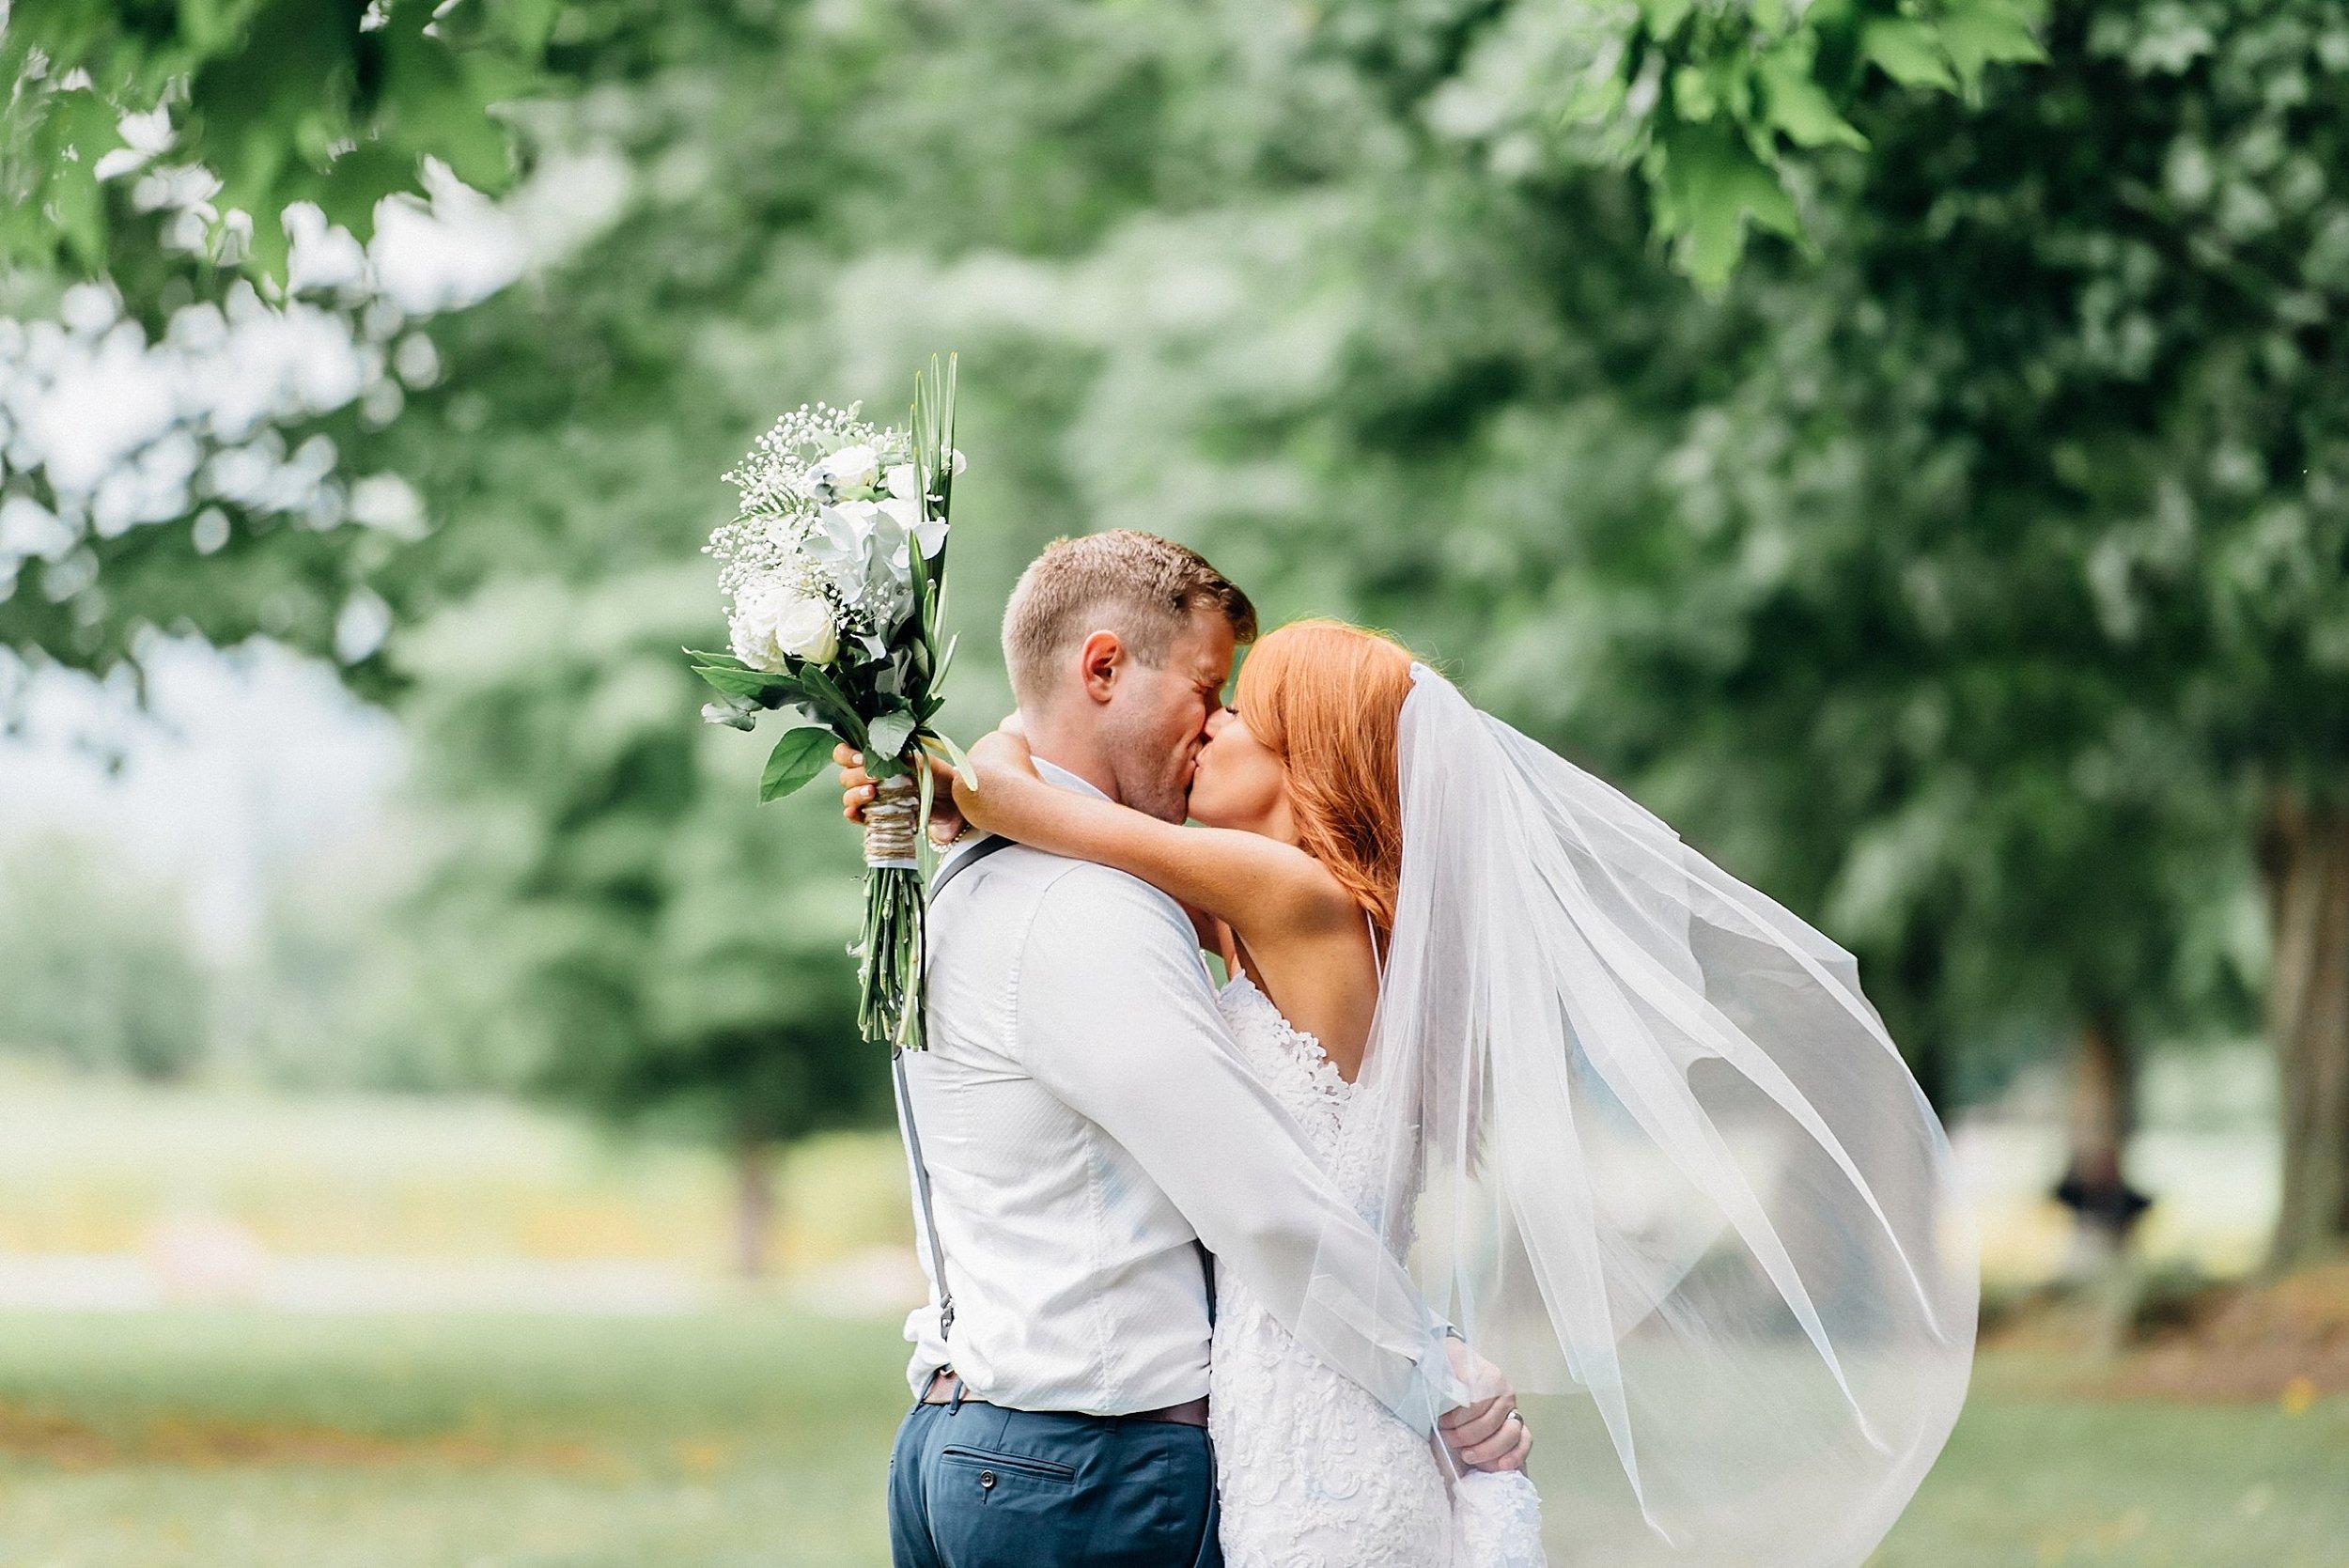 Ottawa Wedding Photographer - Stanley's Olde Maple Lane Barn Wedding - Ali & Batoul Photography_0041.jpg